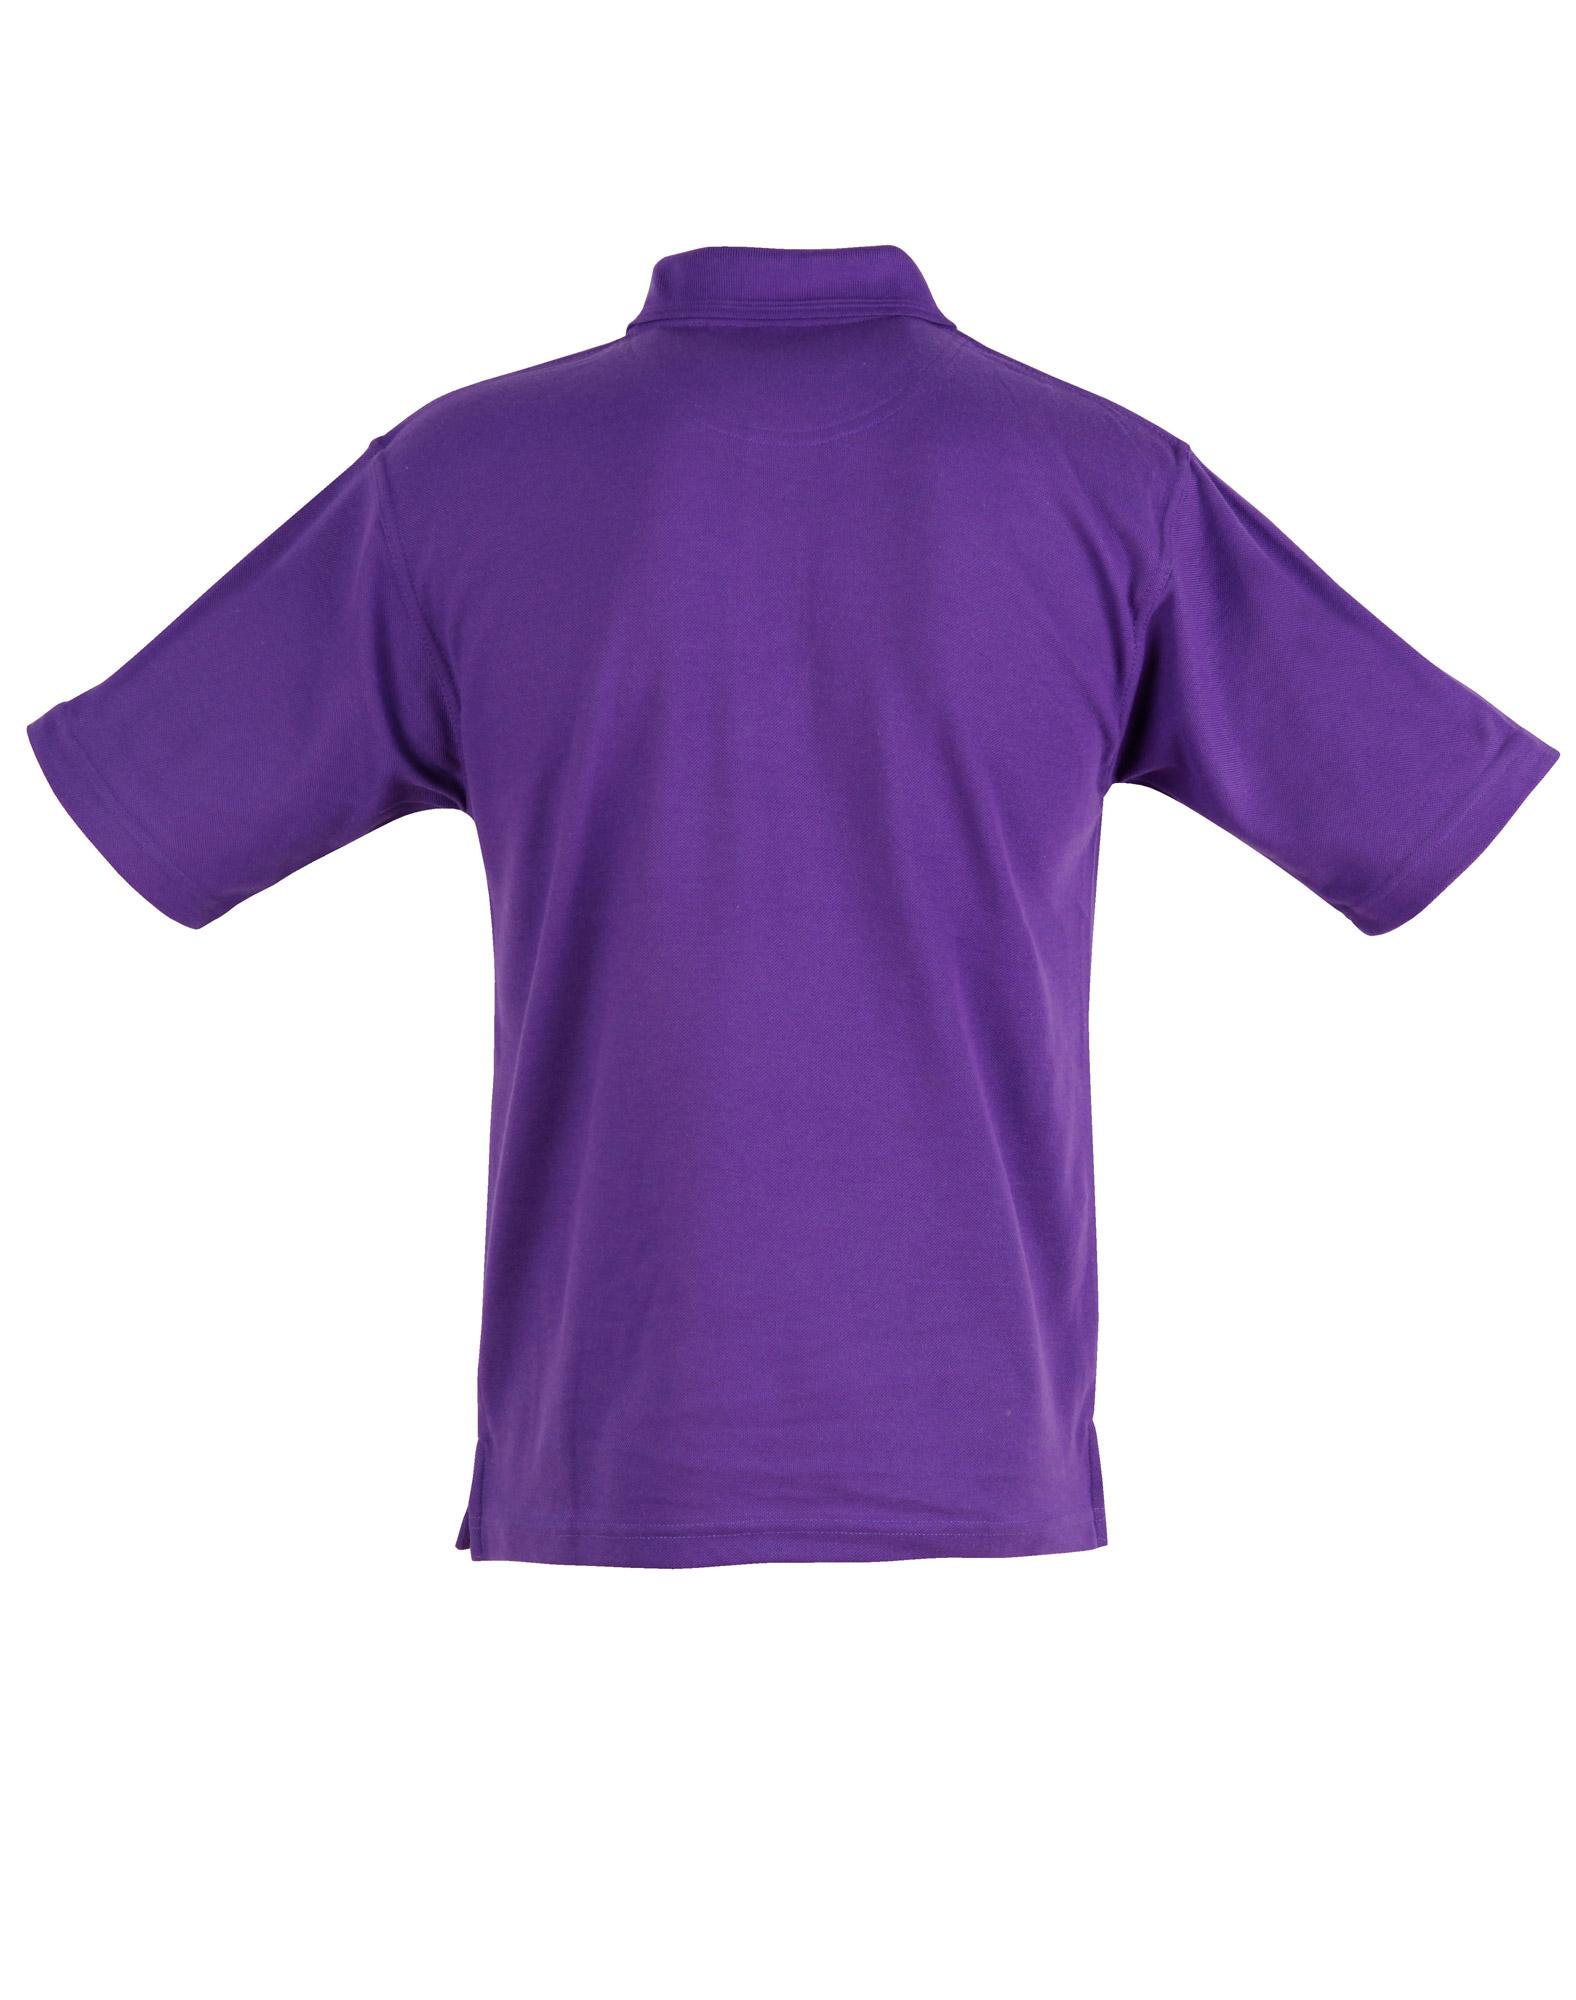 https://s3-ap-southeast-1.amazonaws.com/ws-imgs/POLOSHIRTS/PS11_Purple_Back_l.jpg